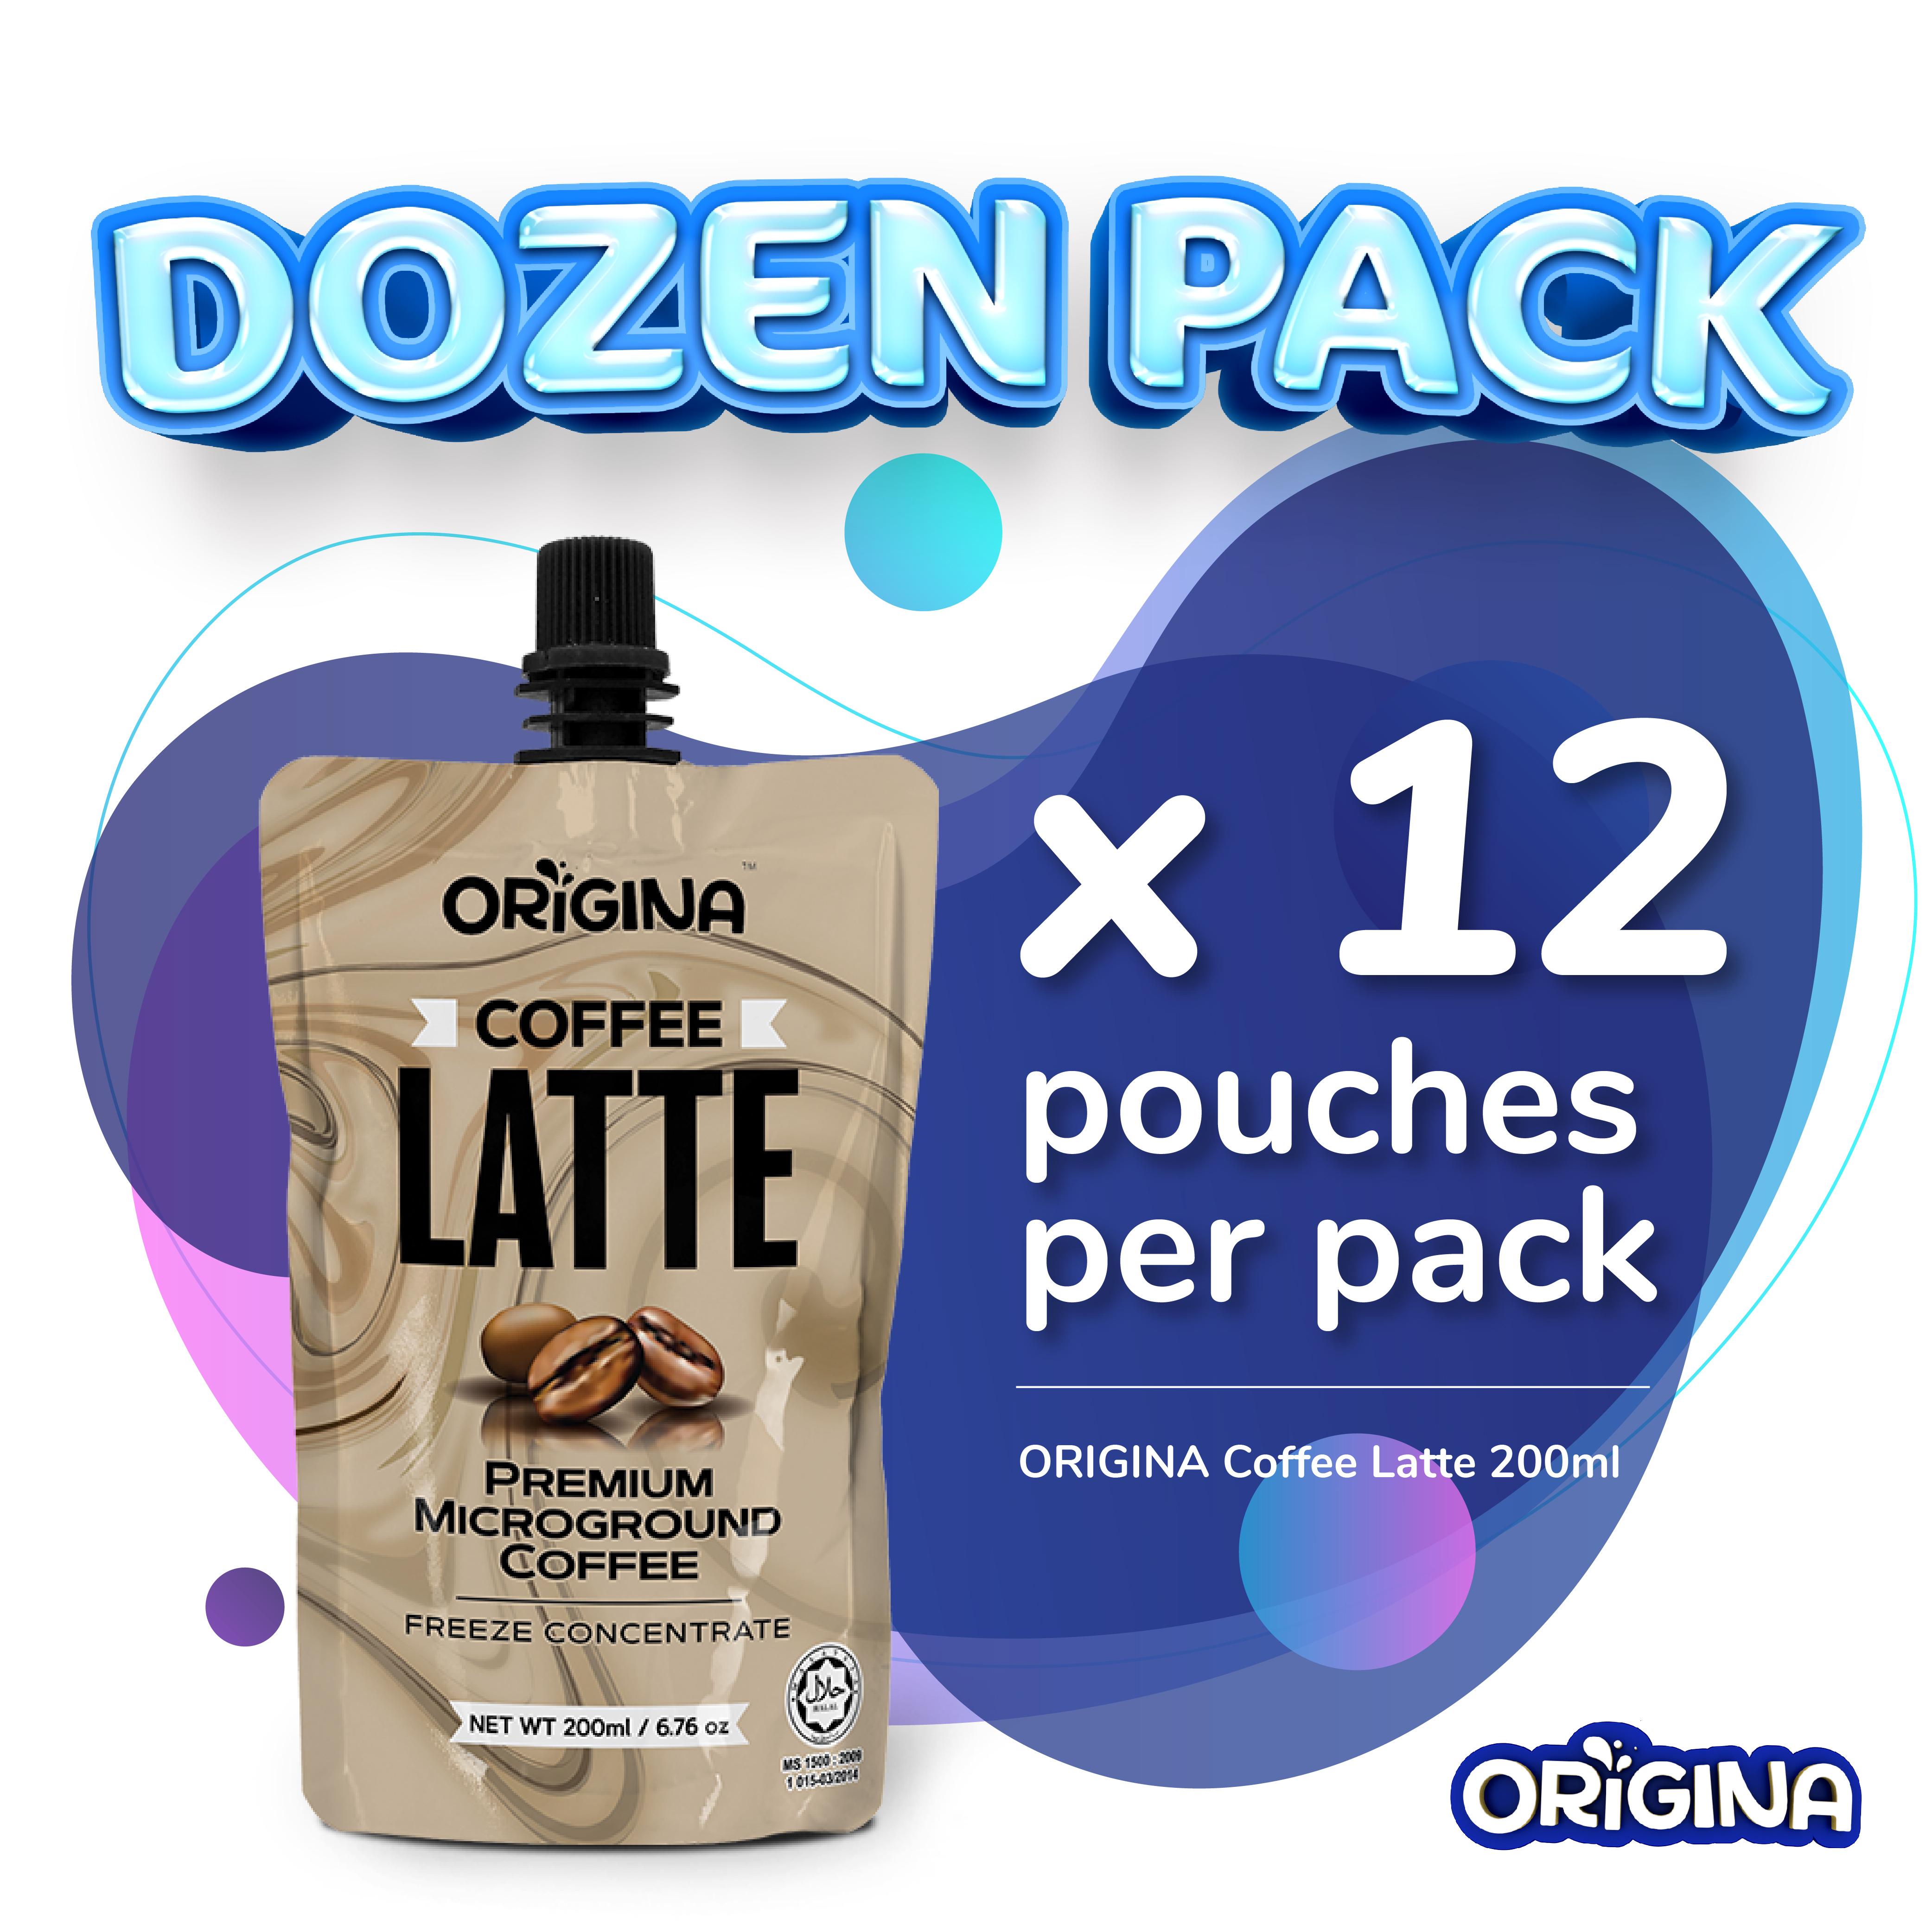 ORIGINA COFFE LATTE 200ml - (12 pcs/ packs)